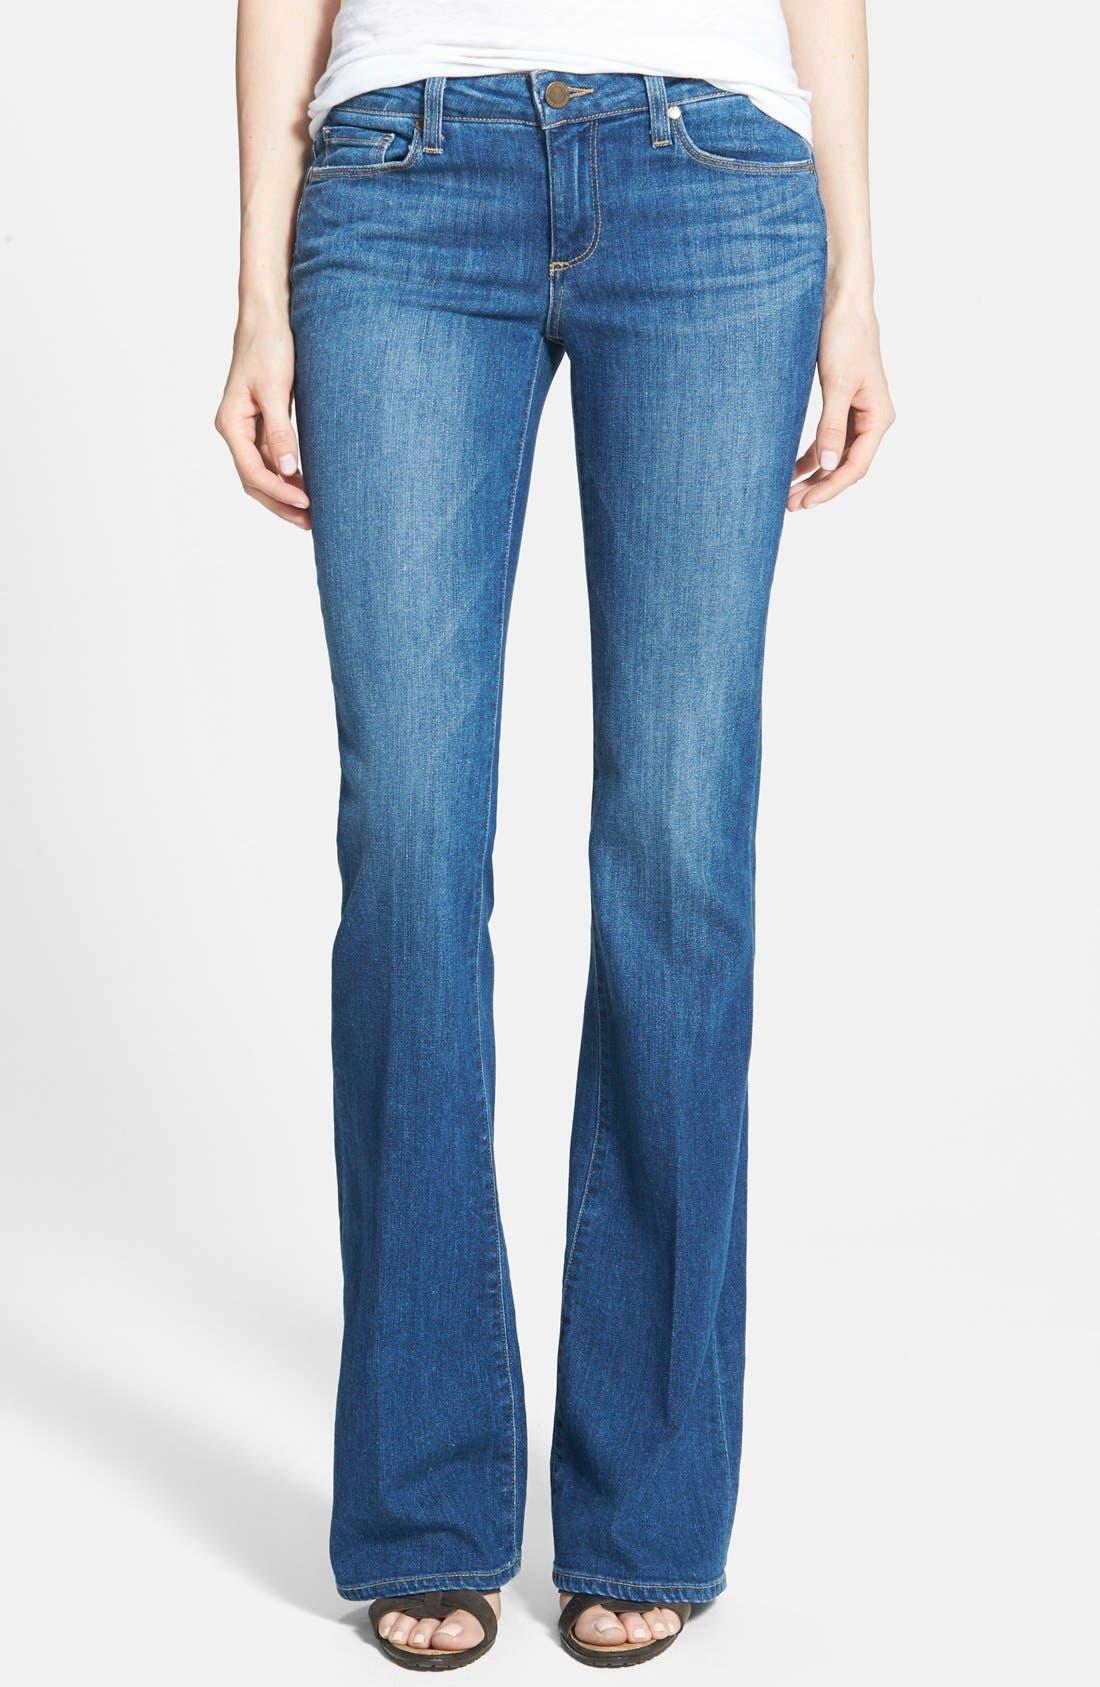 Alternate Image 1 Selected - Paige Denim 'Skyline' Bootcut Jeans (Frances)